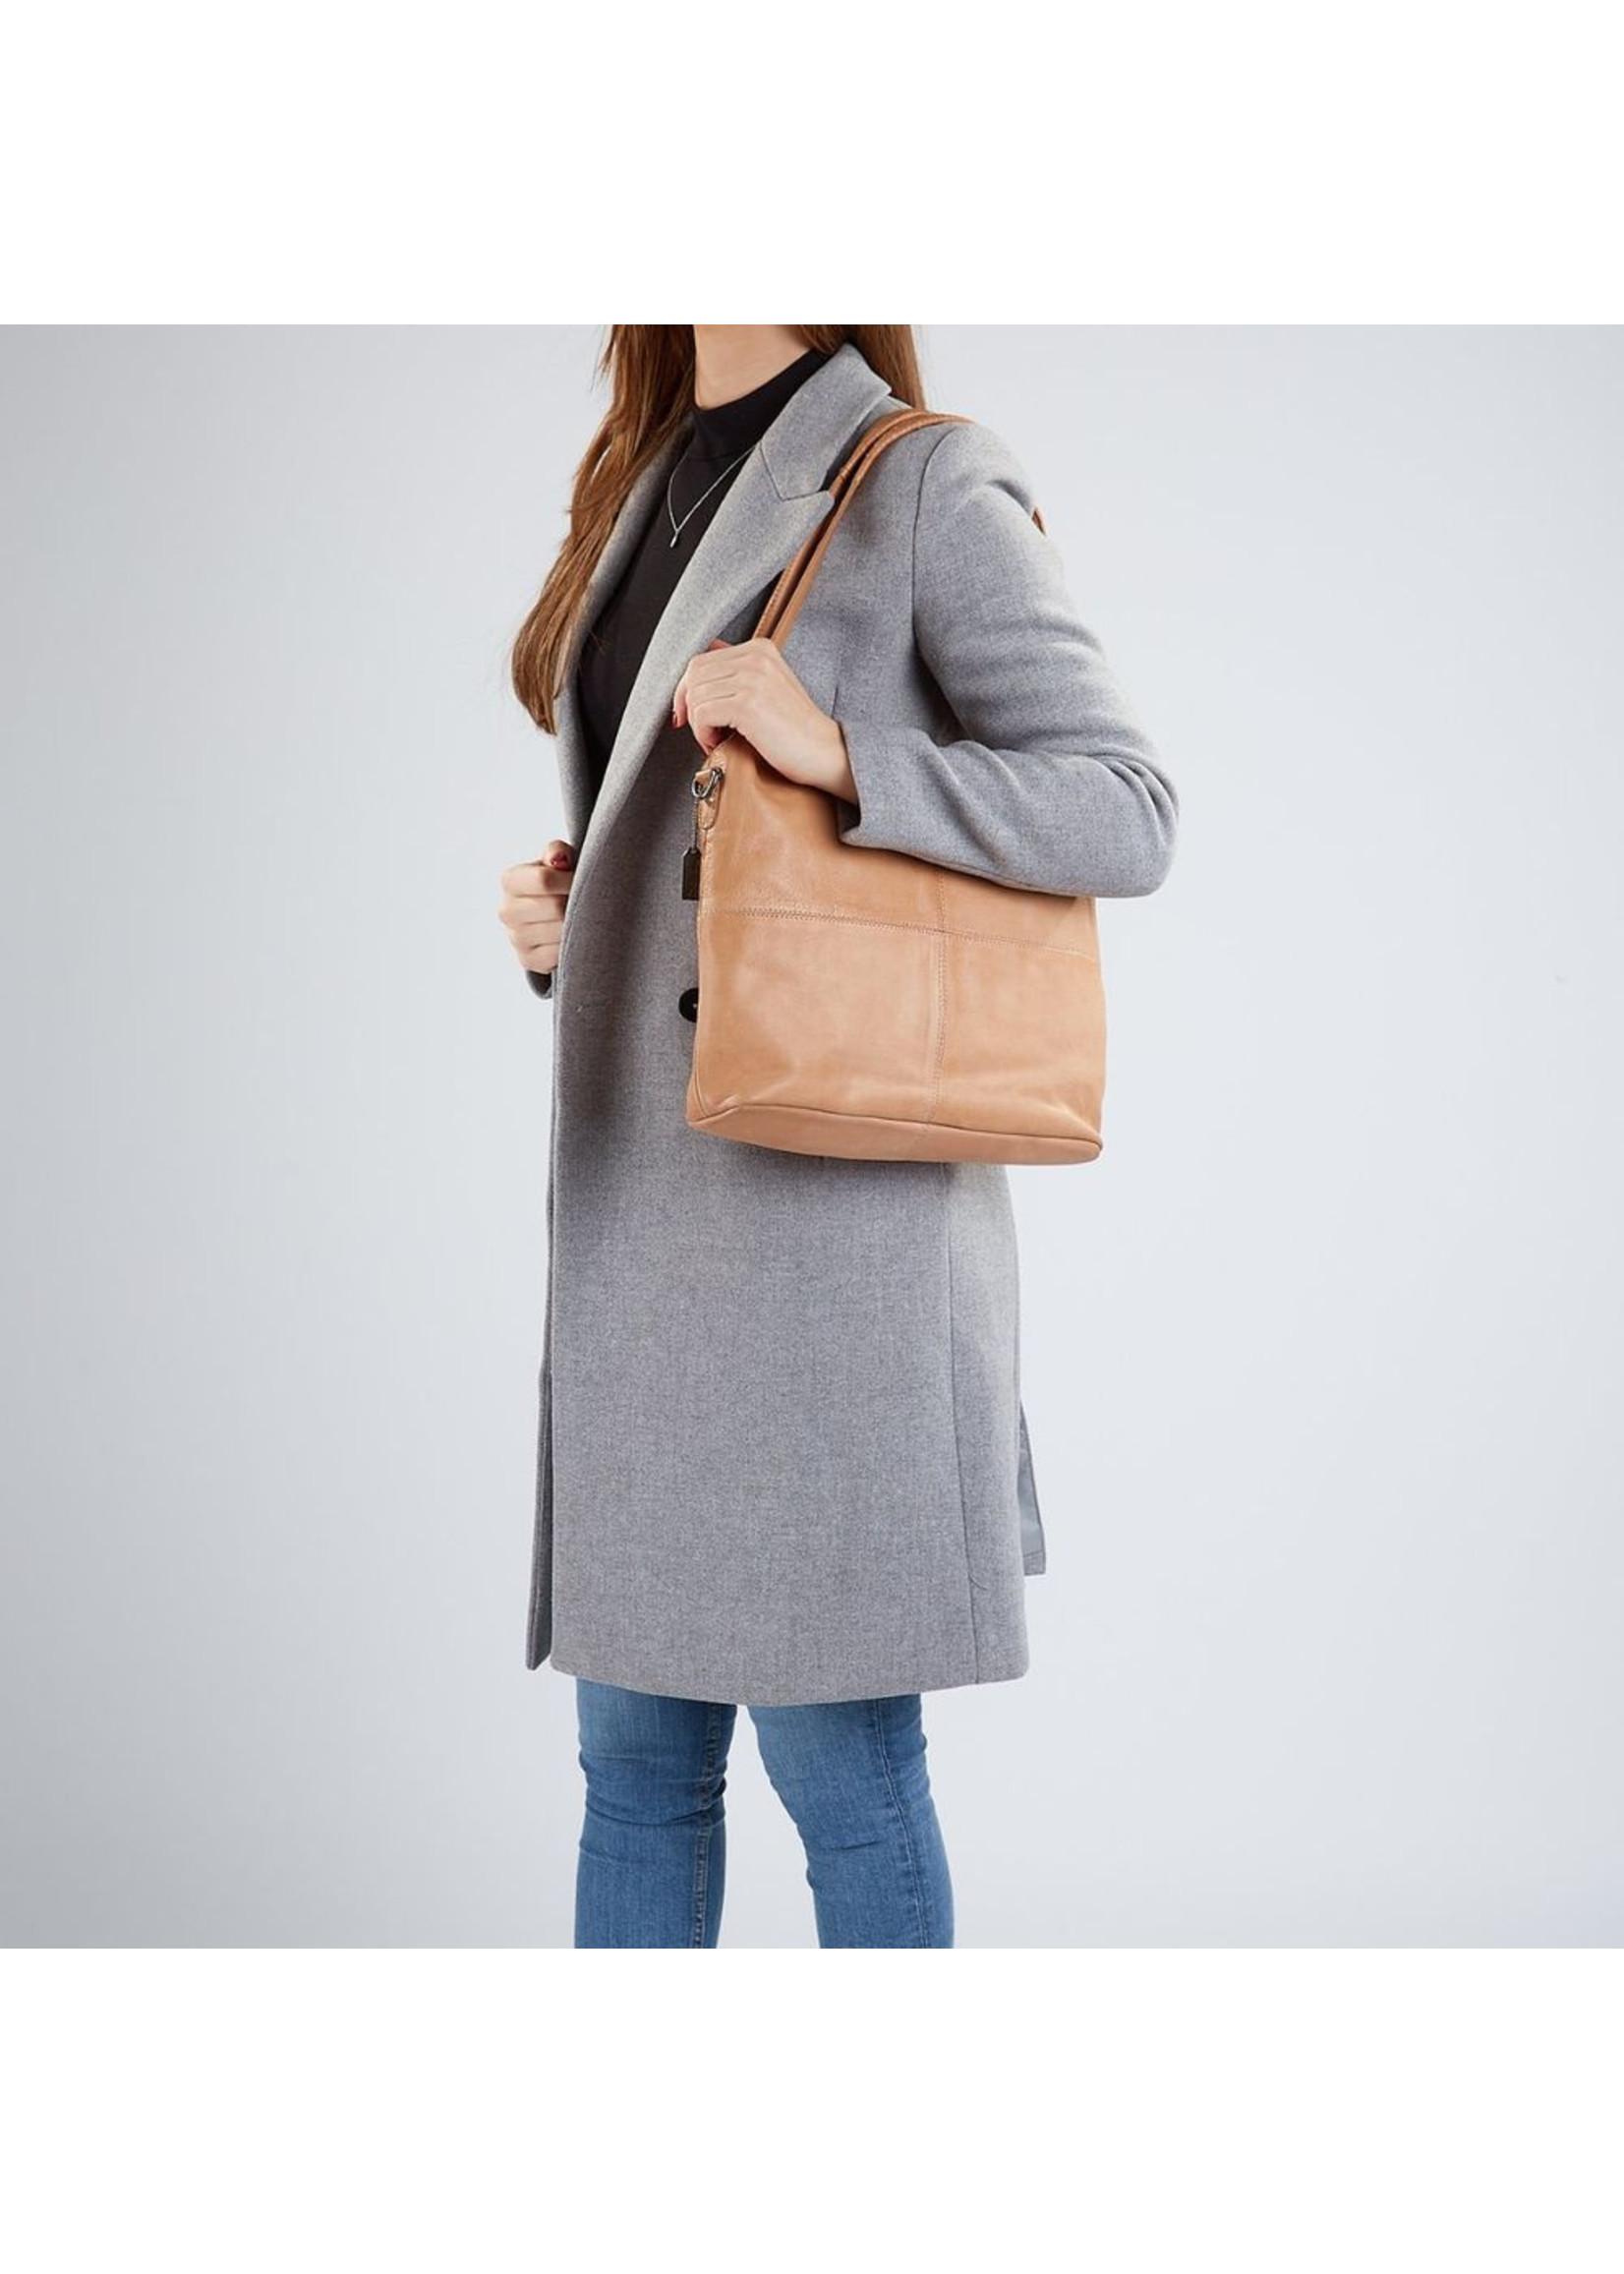 Chabo Bags Street Ox Jara Fashion Bag Zand